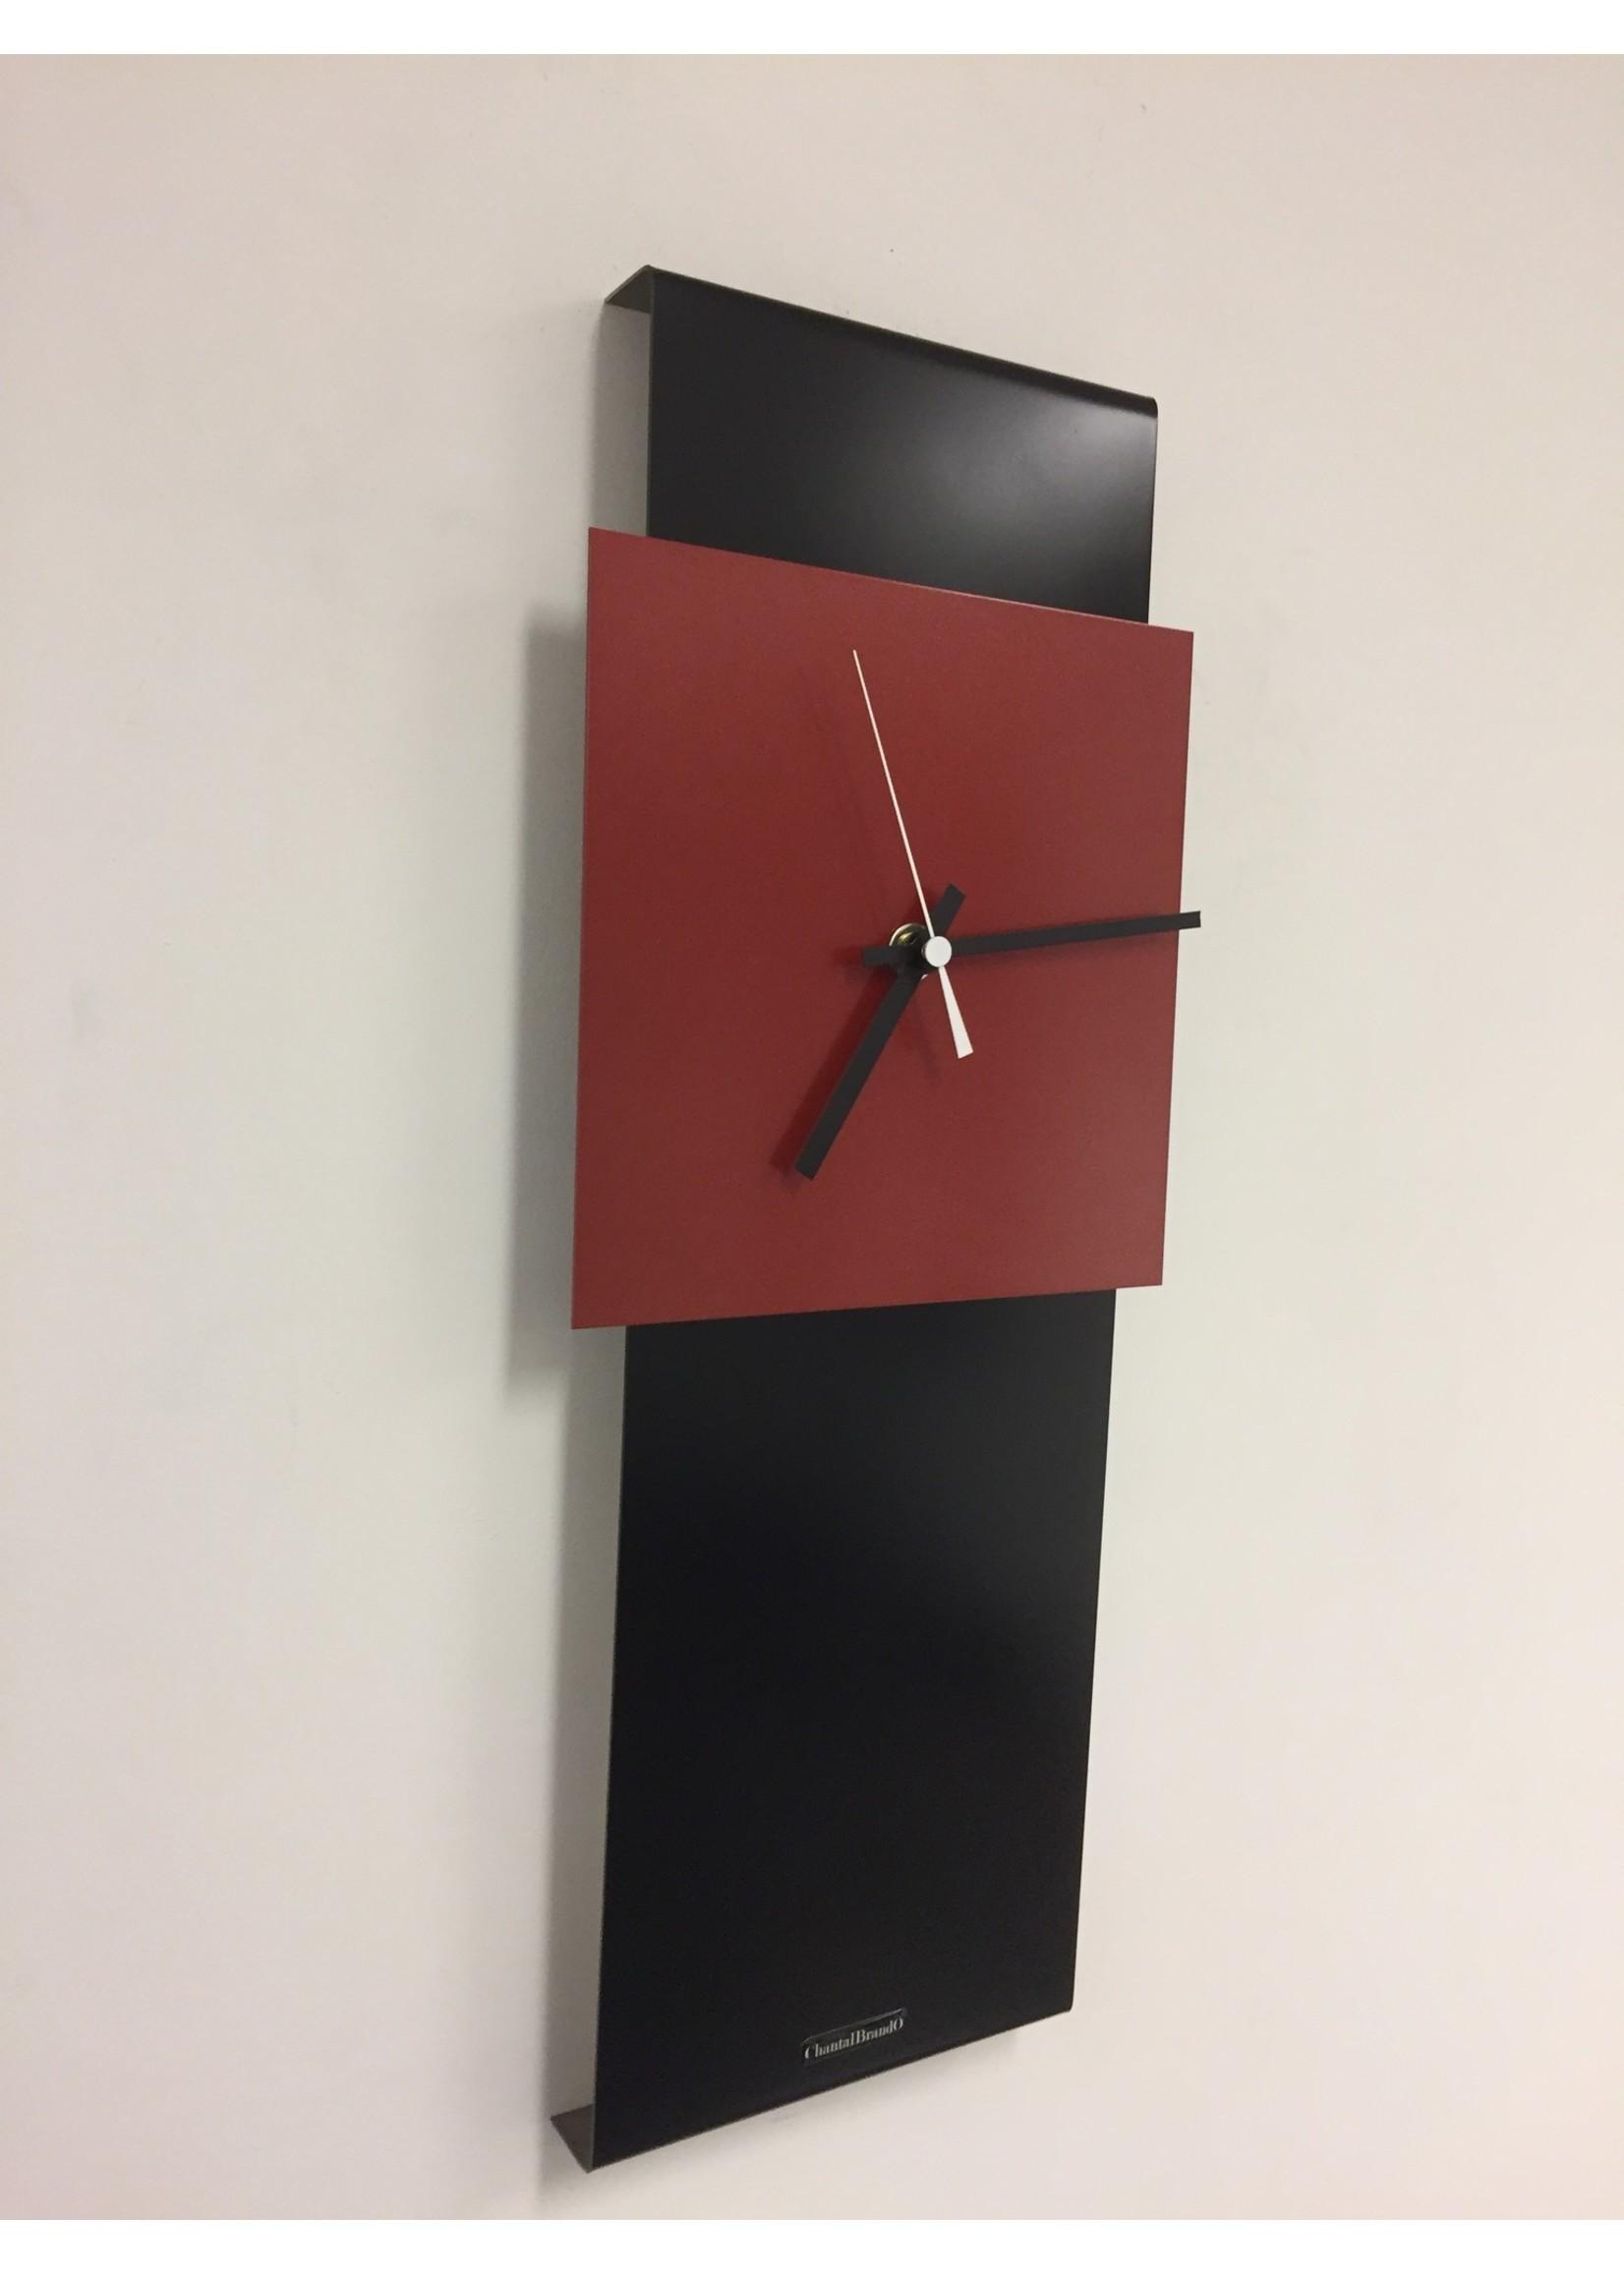 Klokkendiscounter Wandklok LaBrand Export Design Black & RED Modern Dutch Design